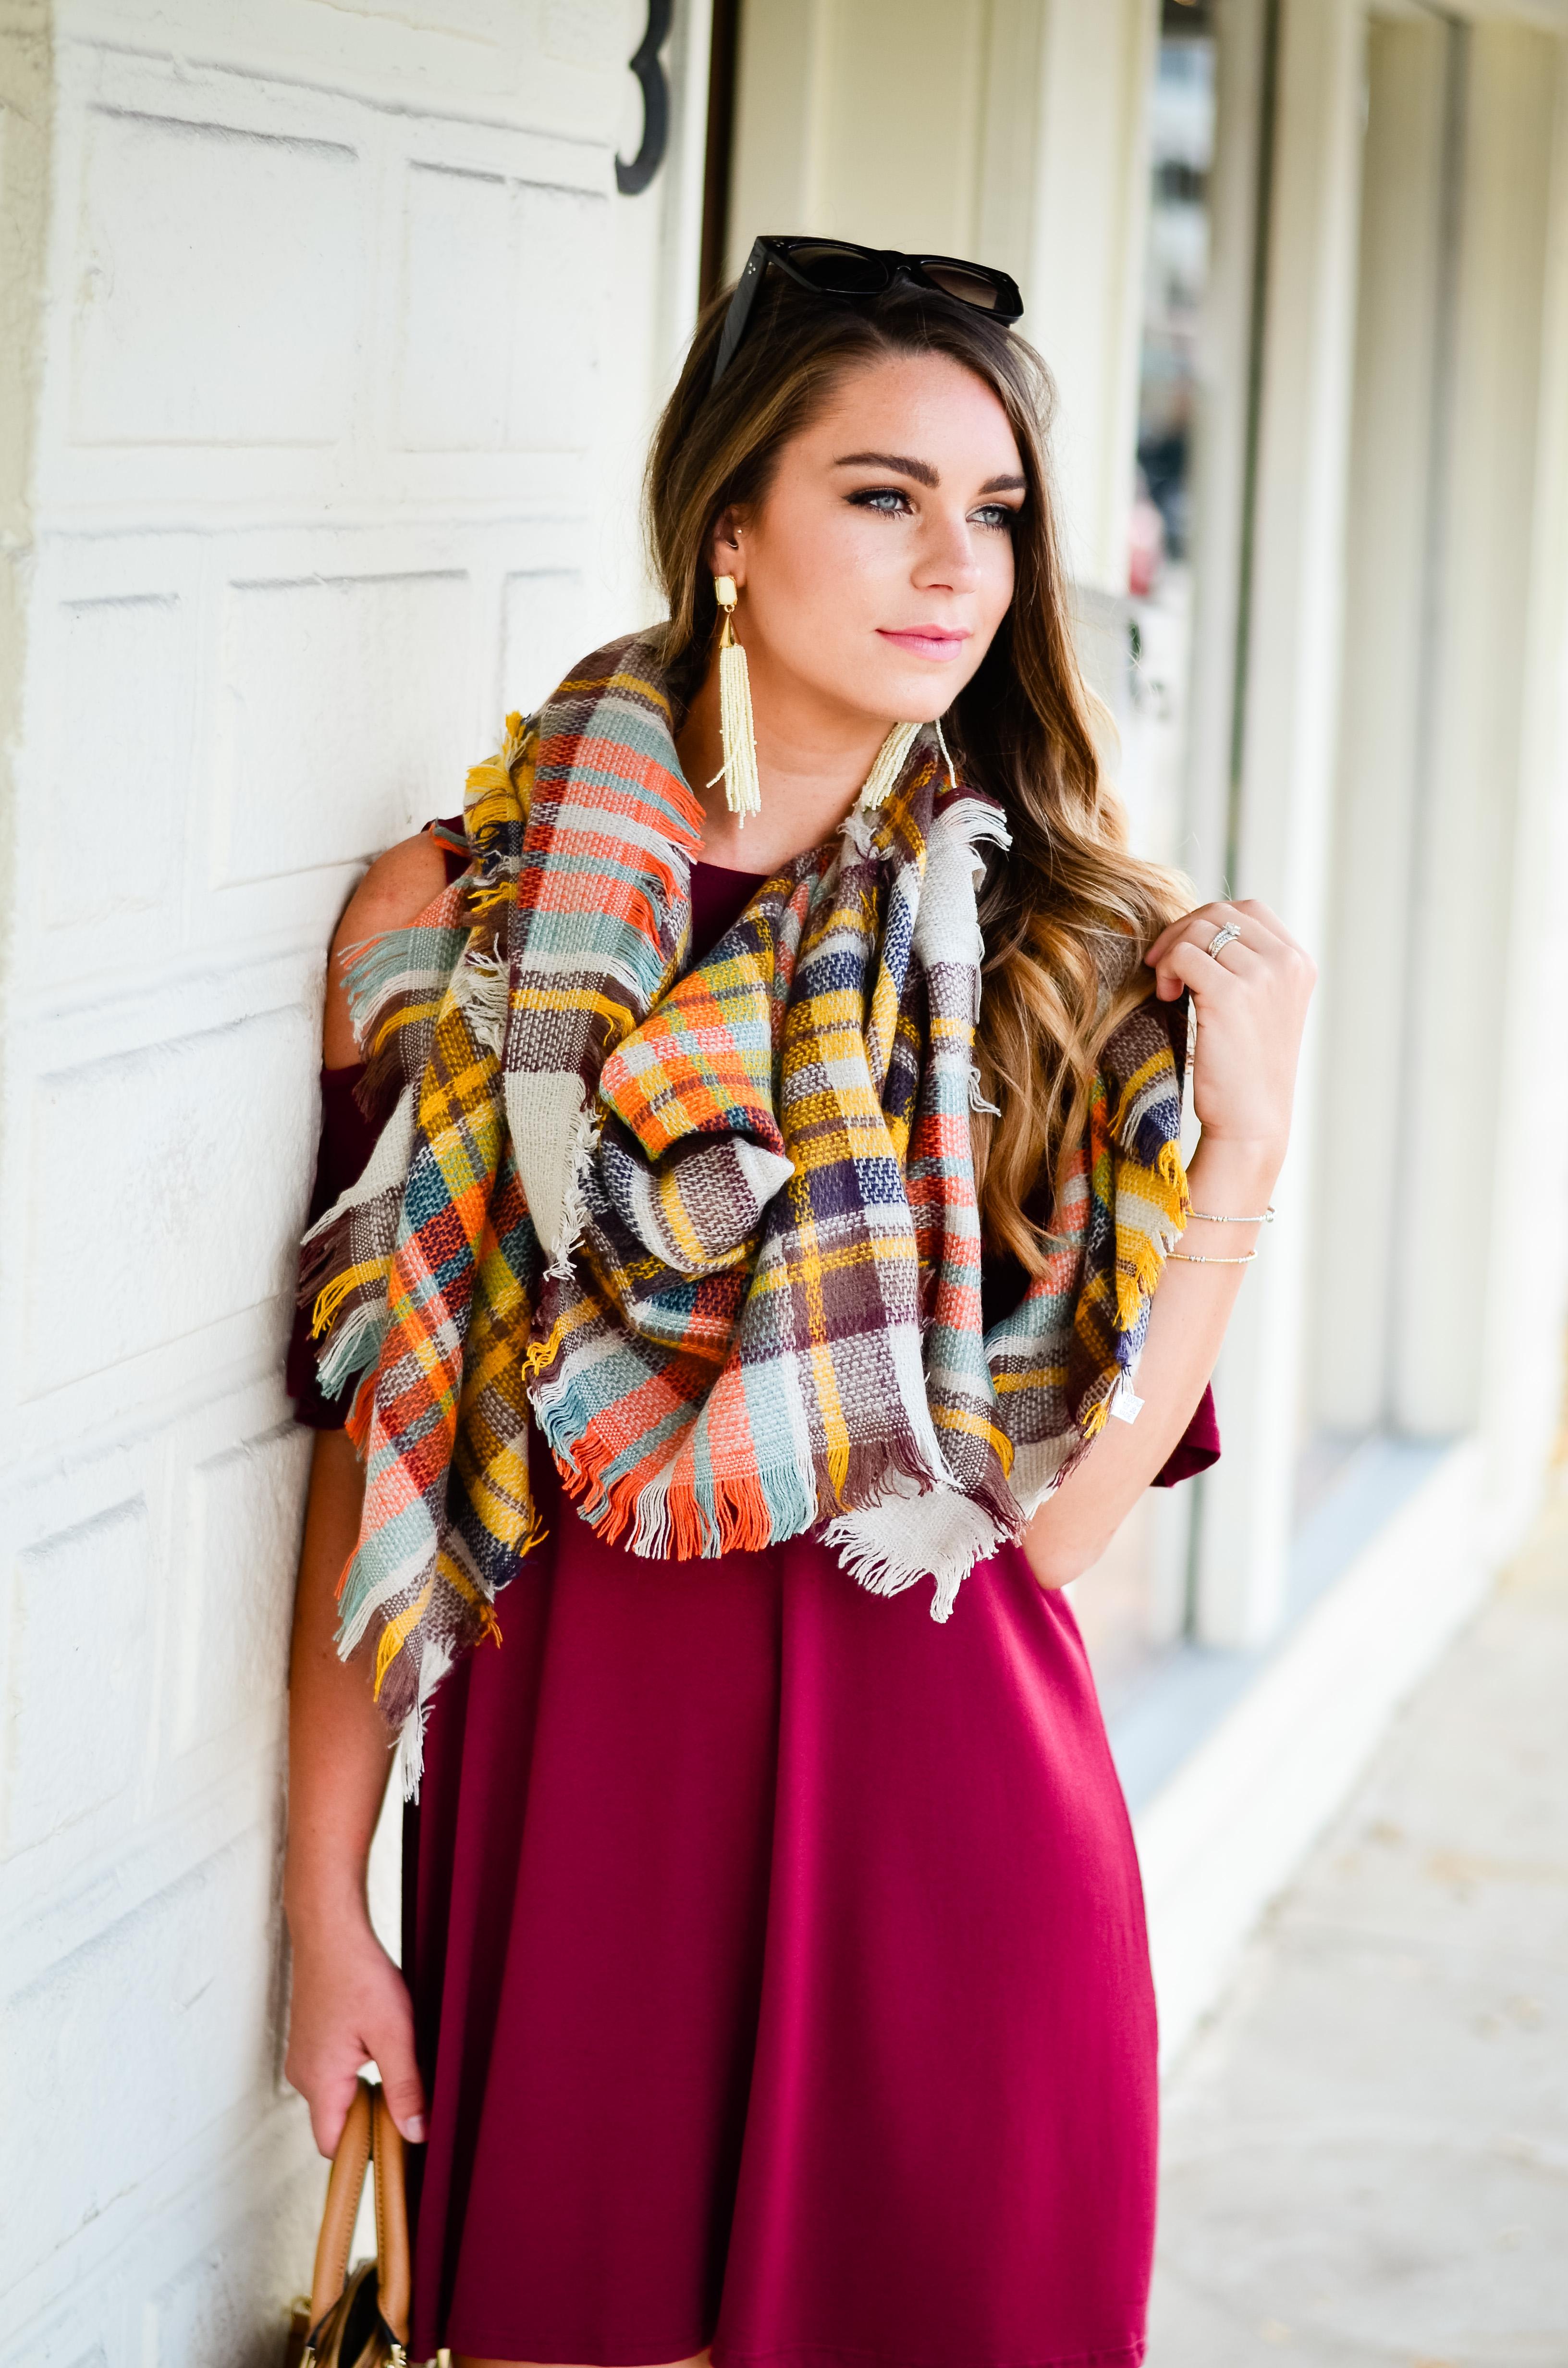 maroon-dress-blanket-scarf-goldfinch-26